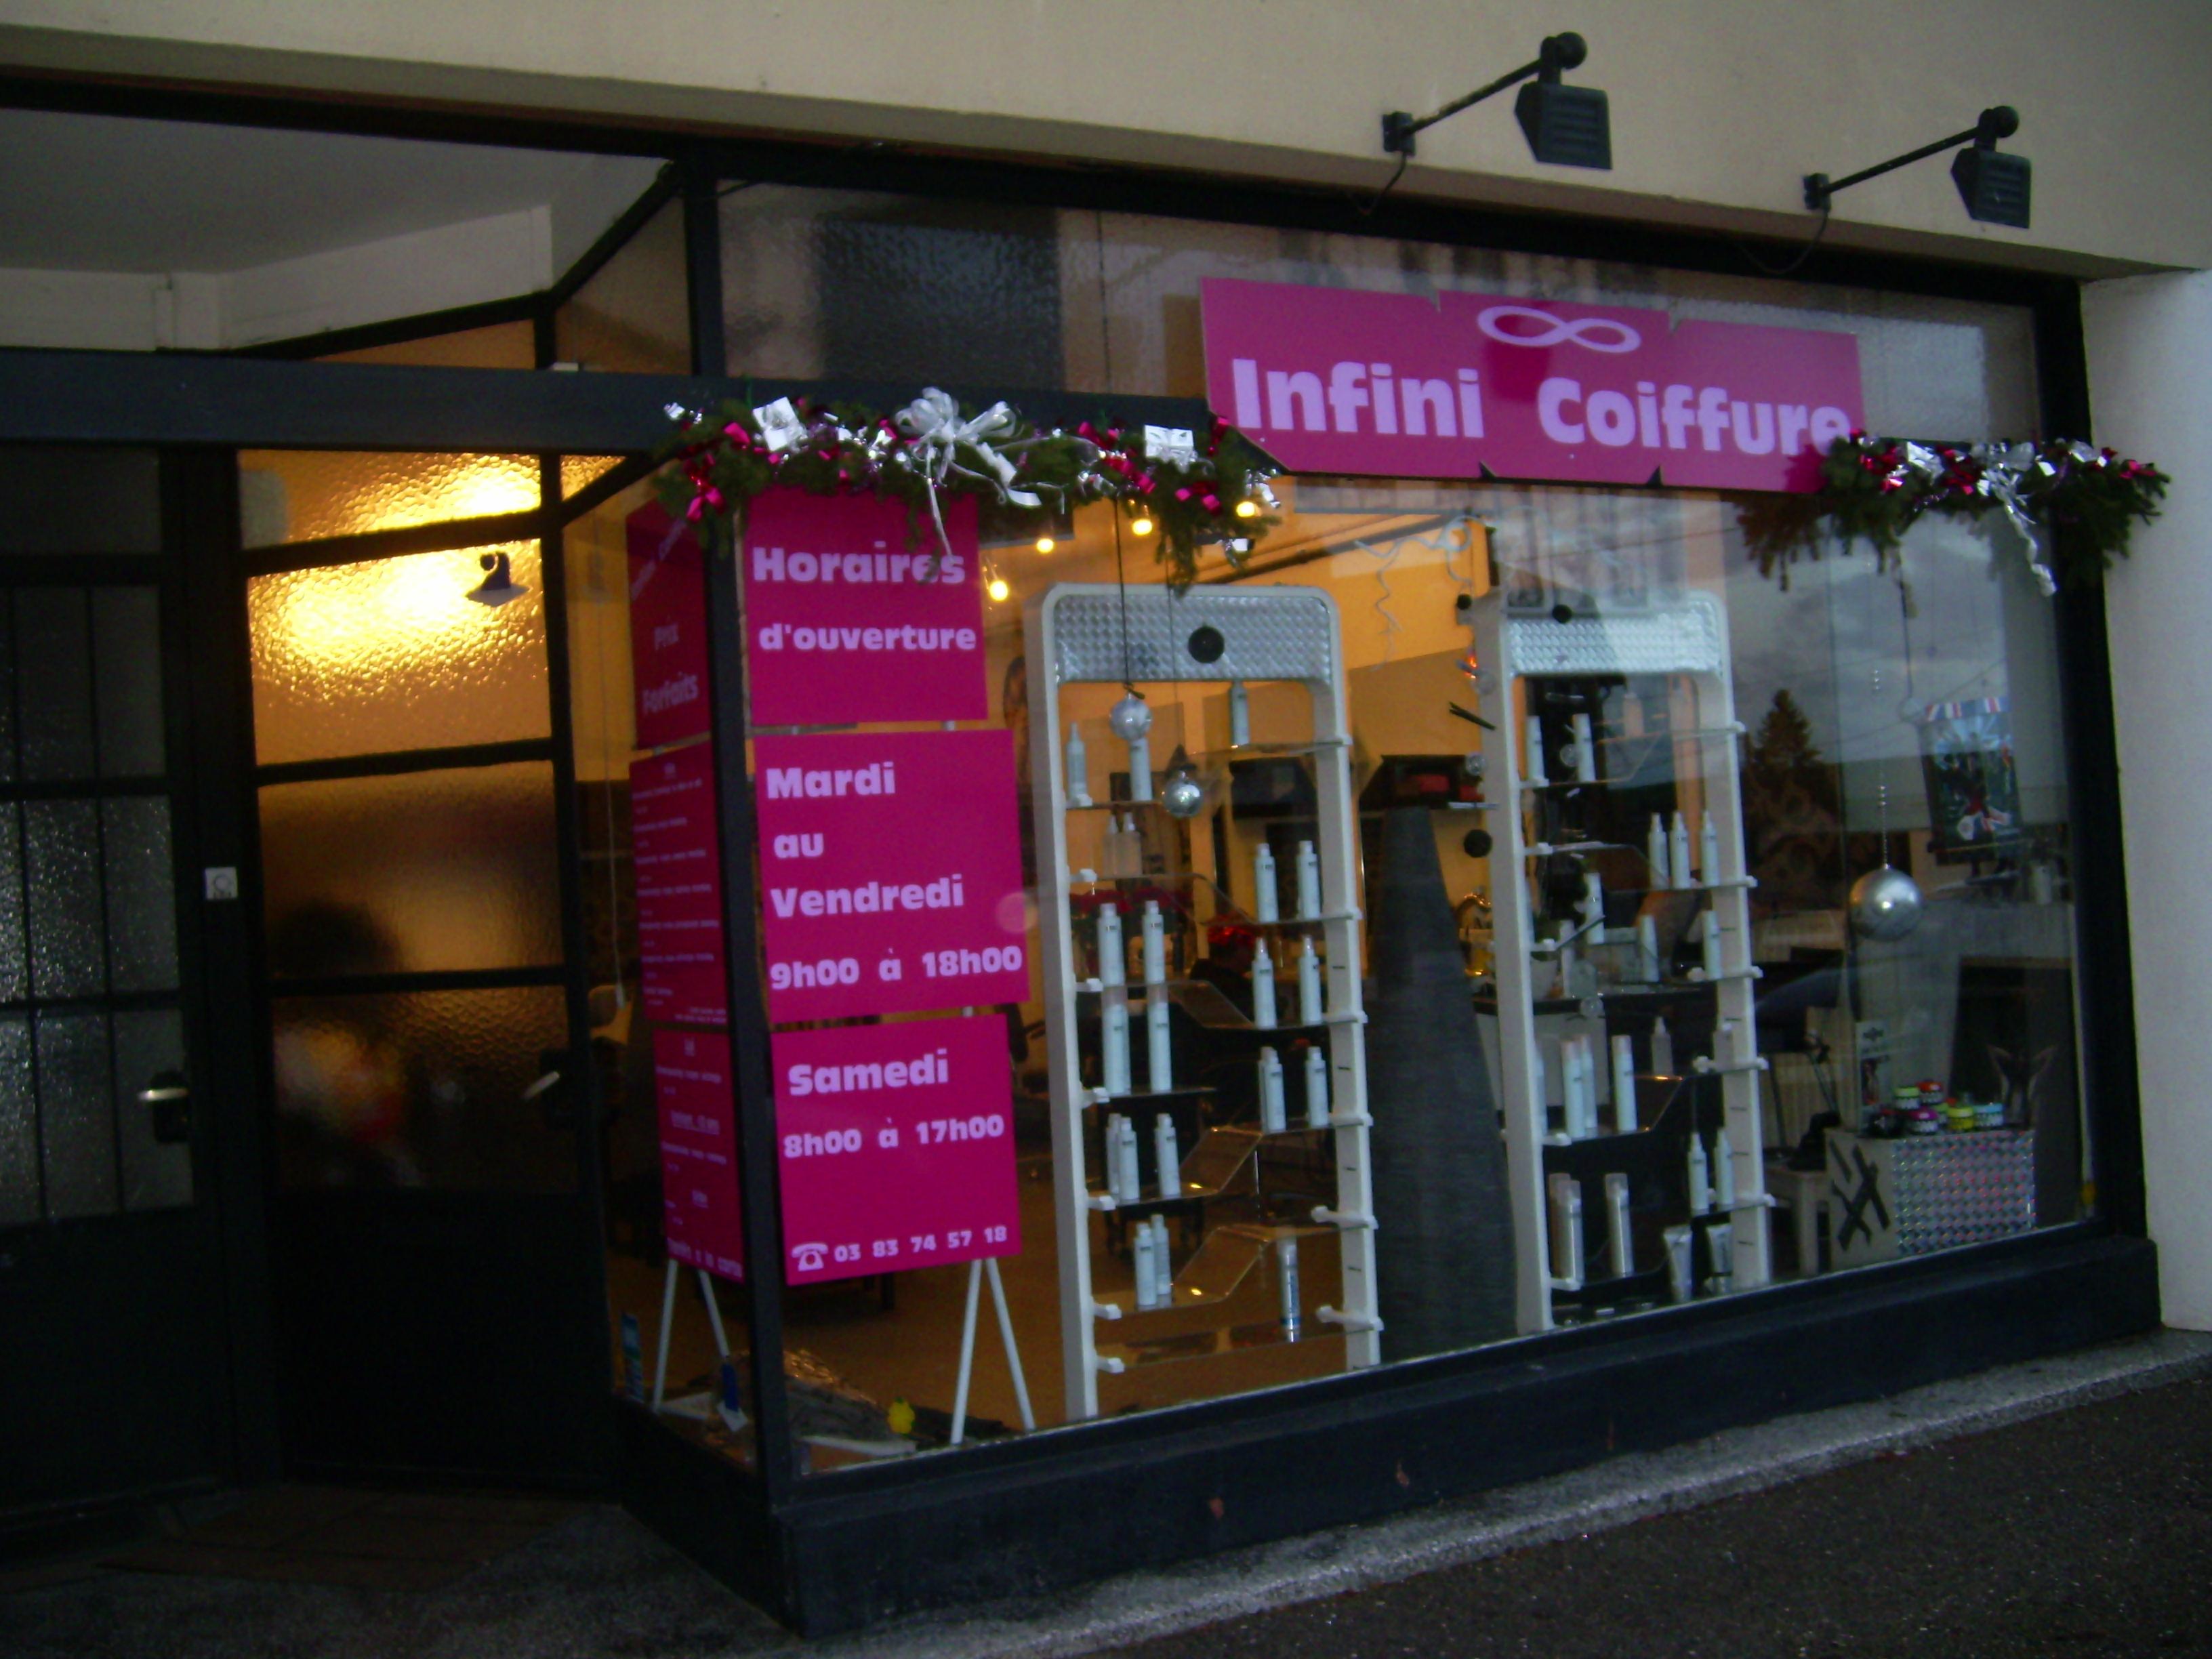 Infini Coiffure